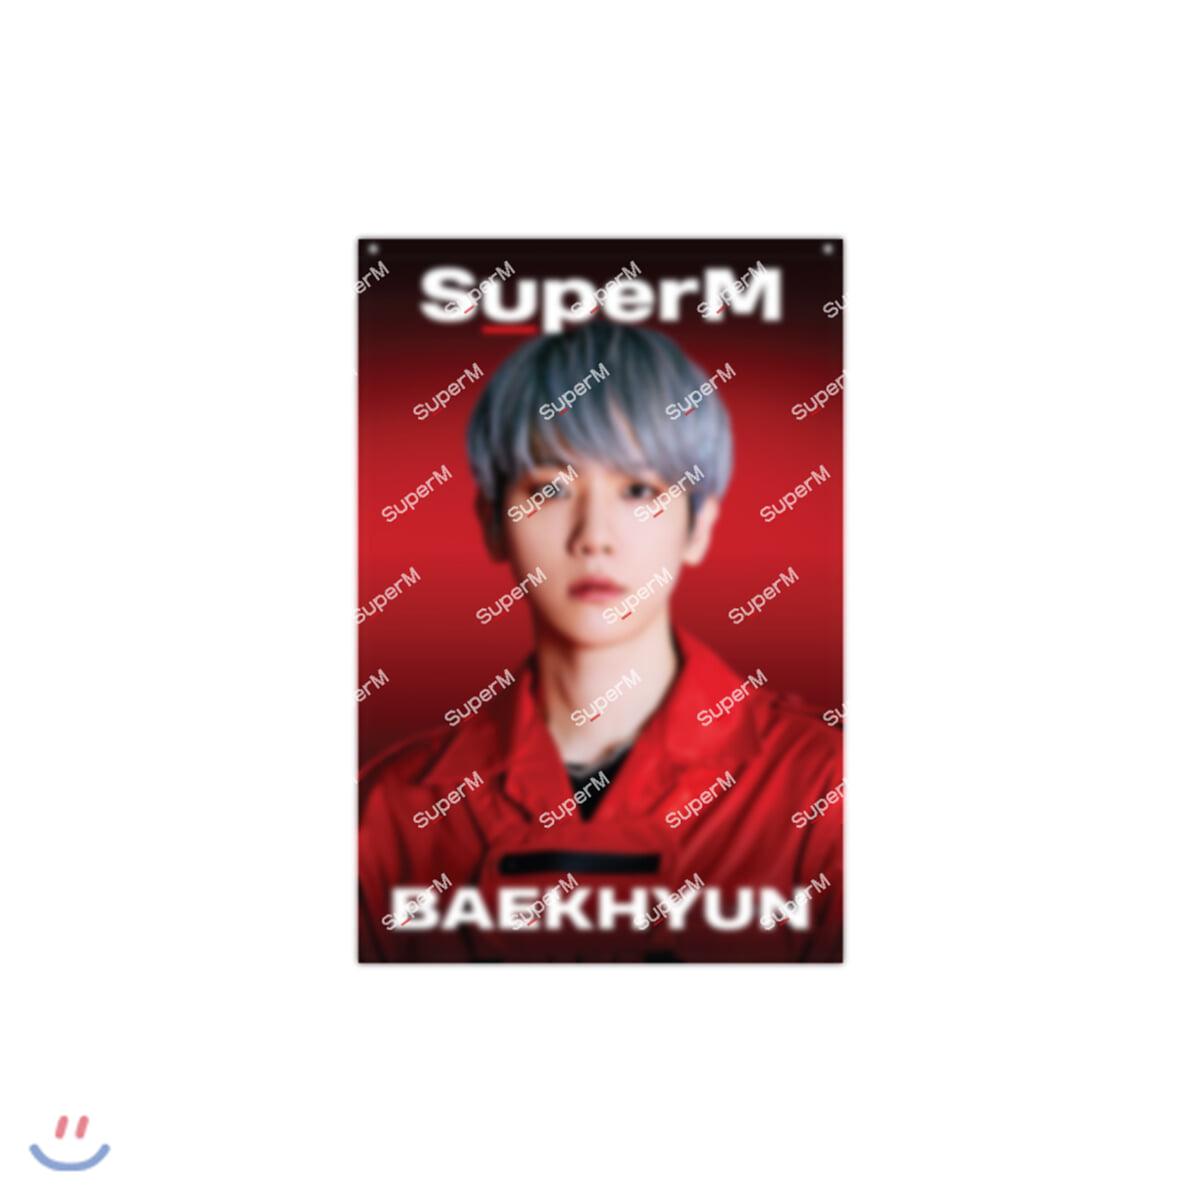 [BAEKHYUN] SuperM SuperOne AR패브릭포스터